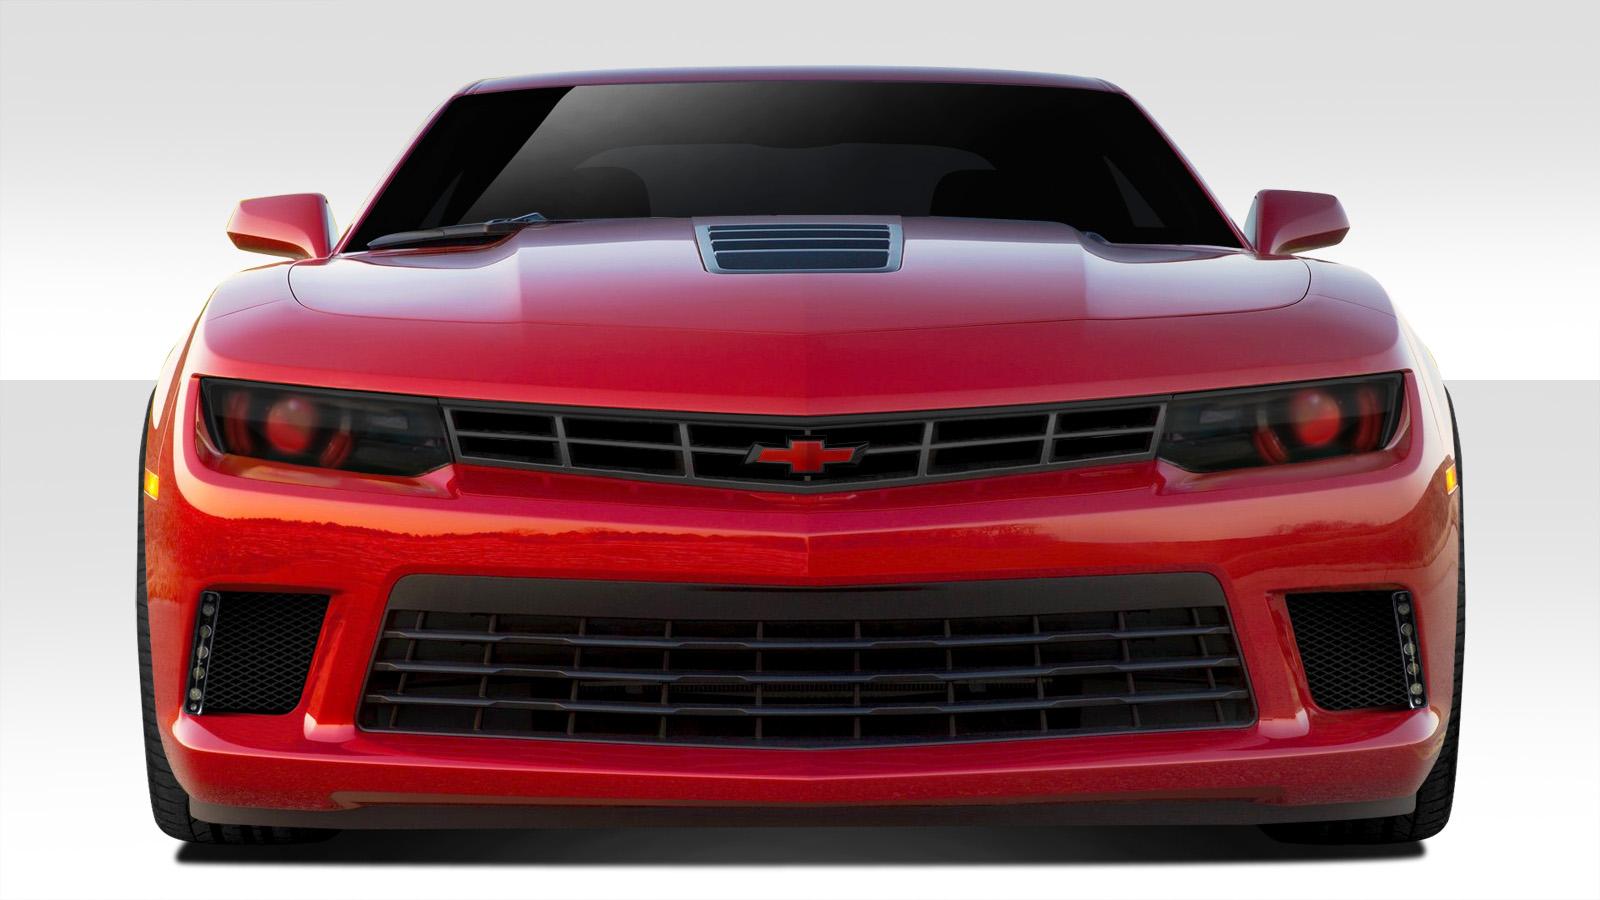 Flexible Front Lip Chin Spoiler Body Kit Air Dam Valance for JAGUAR LOTUS MINI